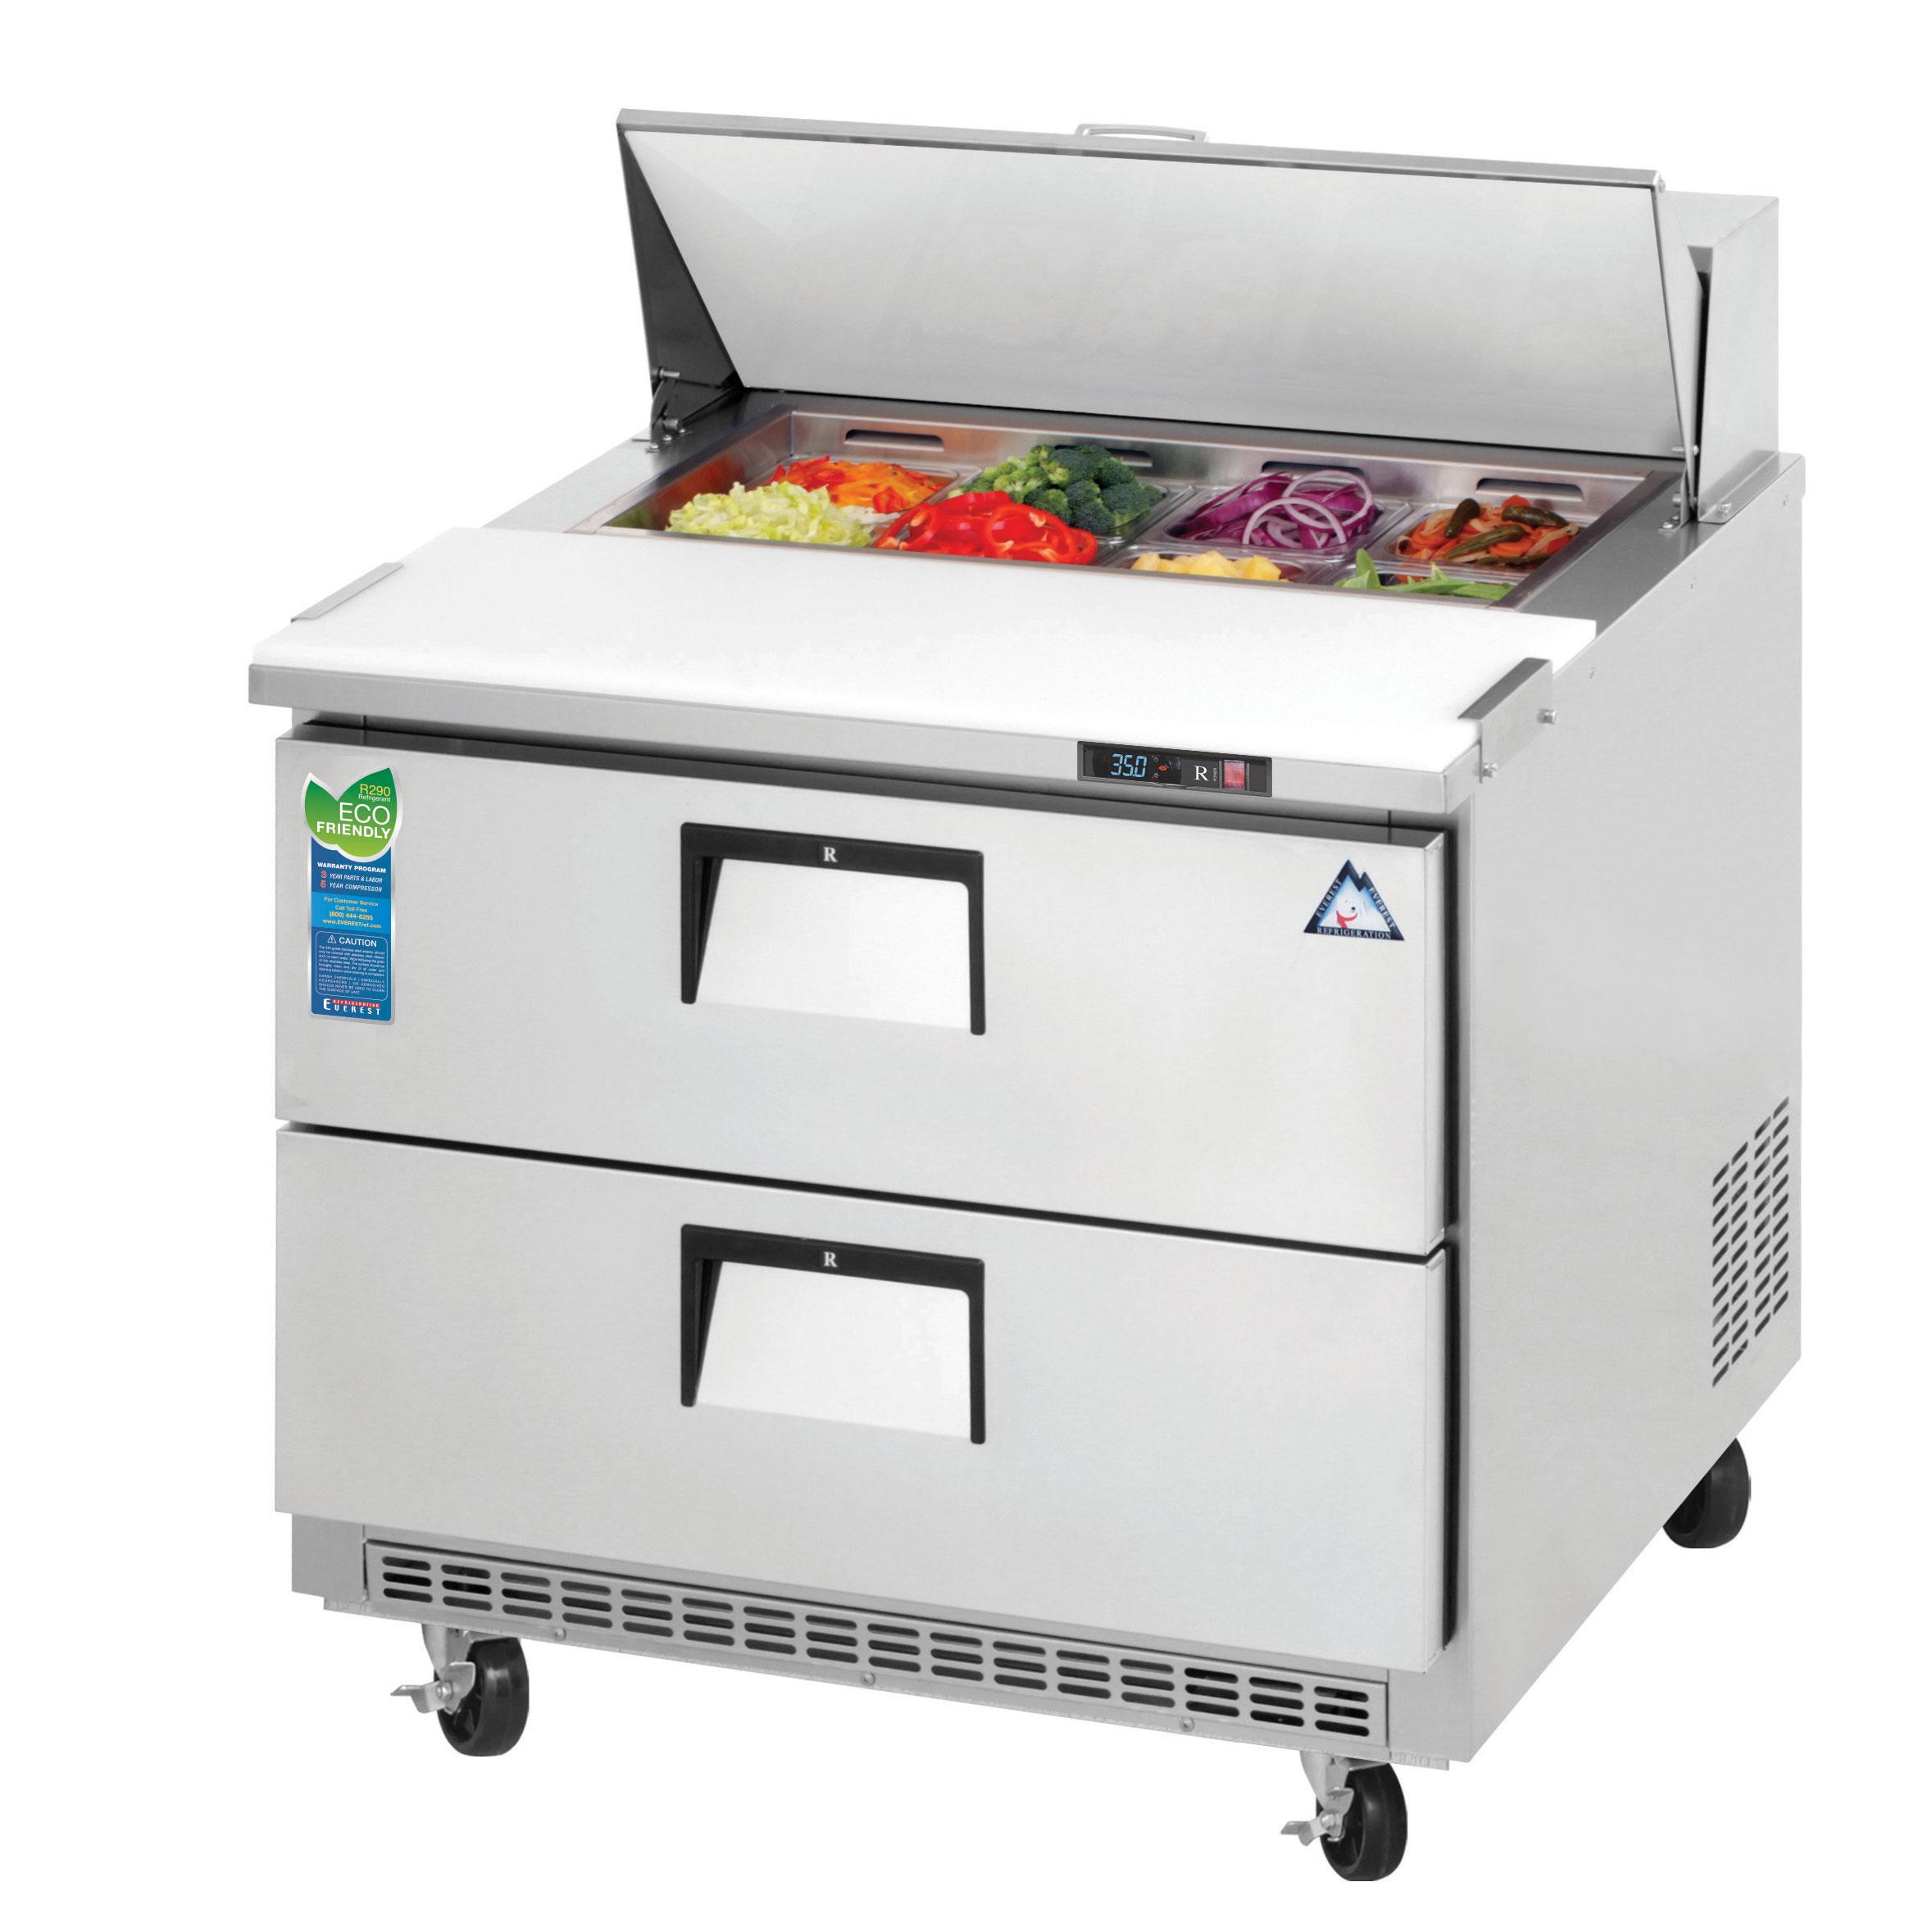 Everest Refrigeration EPBNSR2-D2 refrigerated counter, sandwich / salad unit